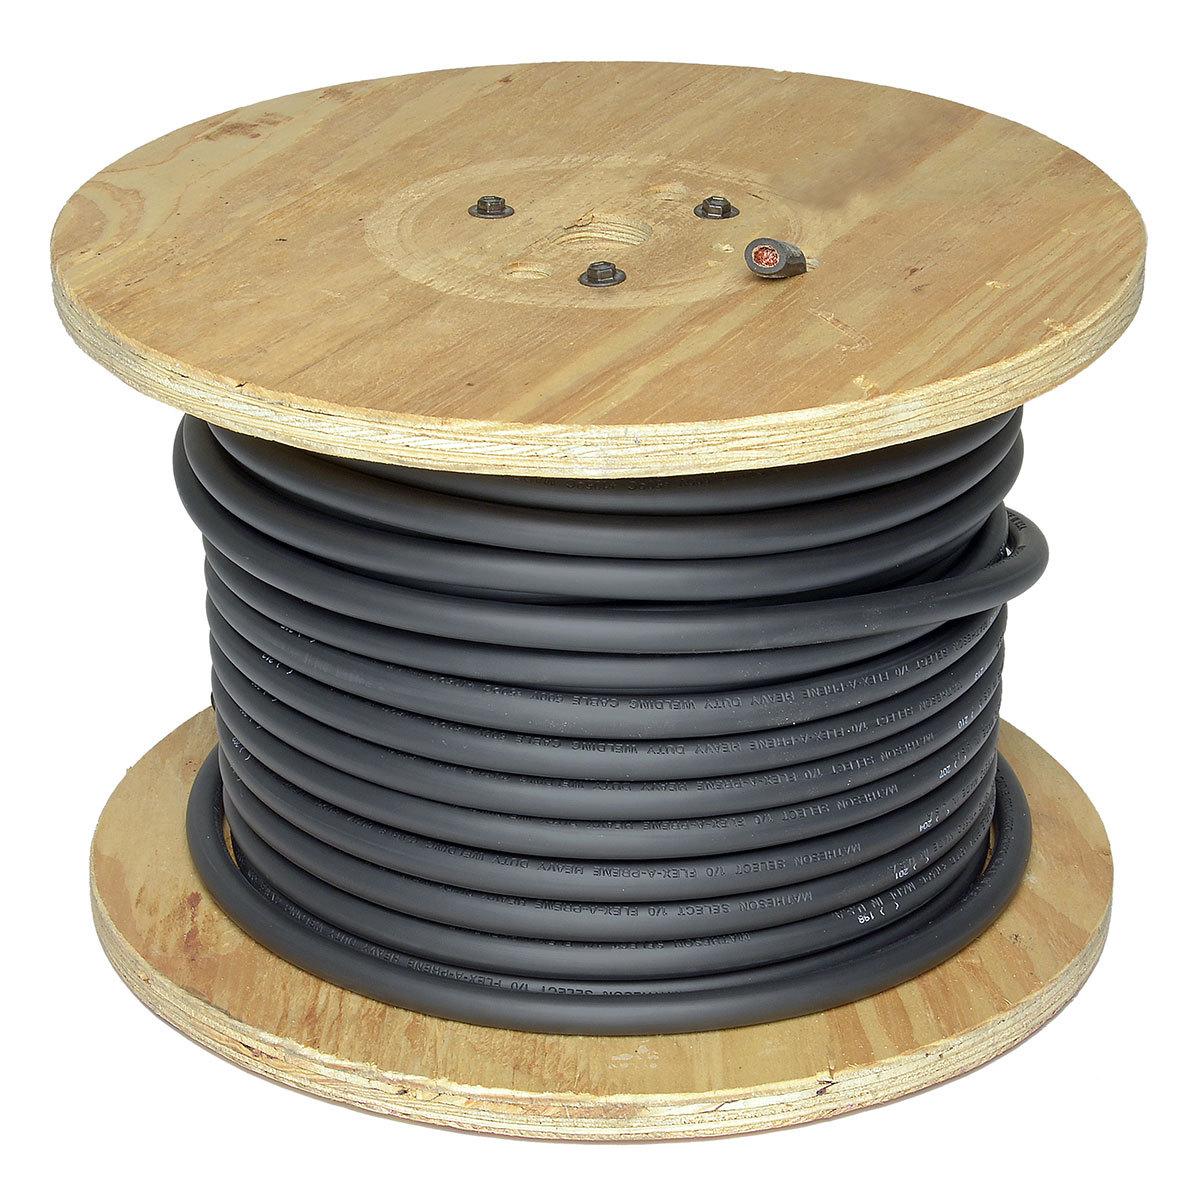 Airgas - DIRFP2359 - Direct Wire & Cable 2/0 Black Flex-A-Prene ...